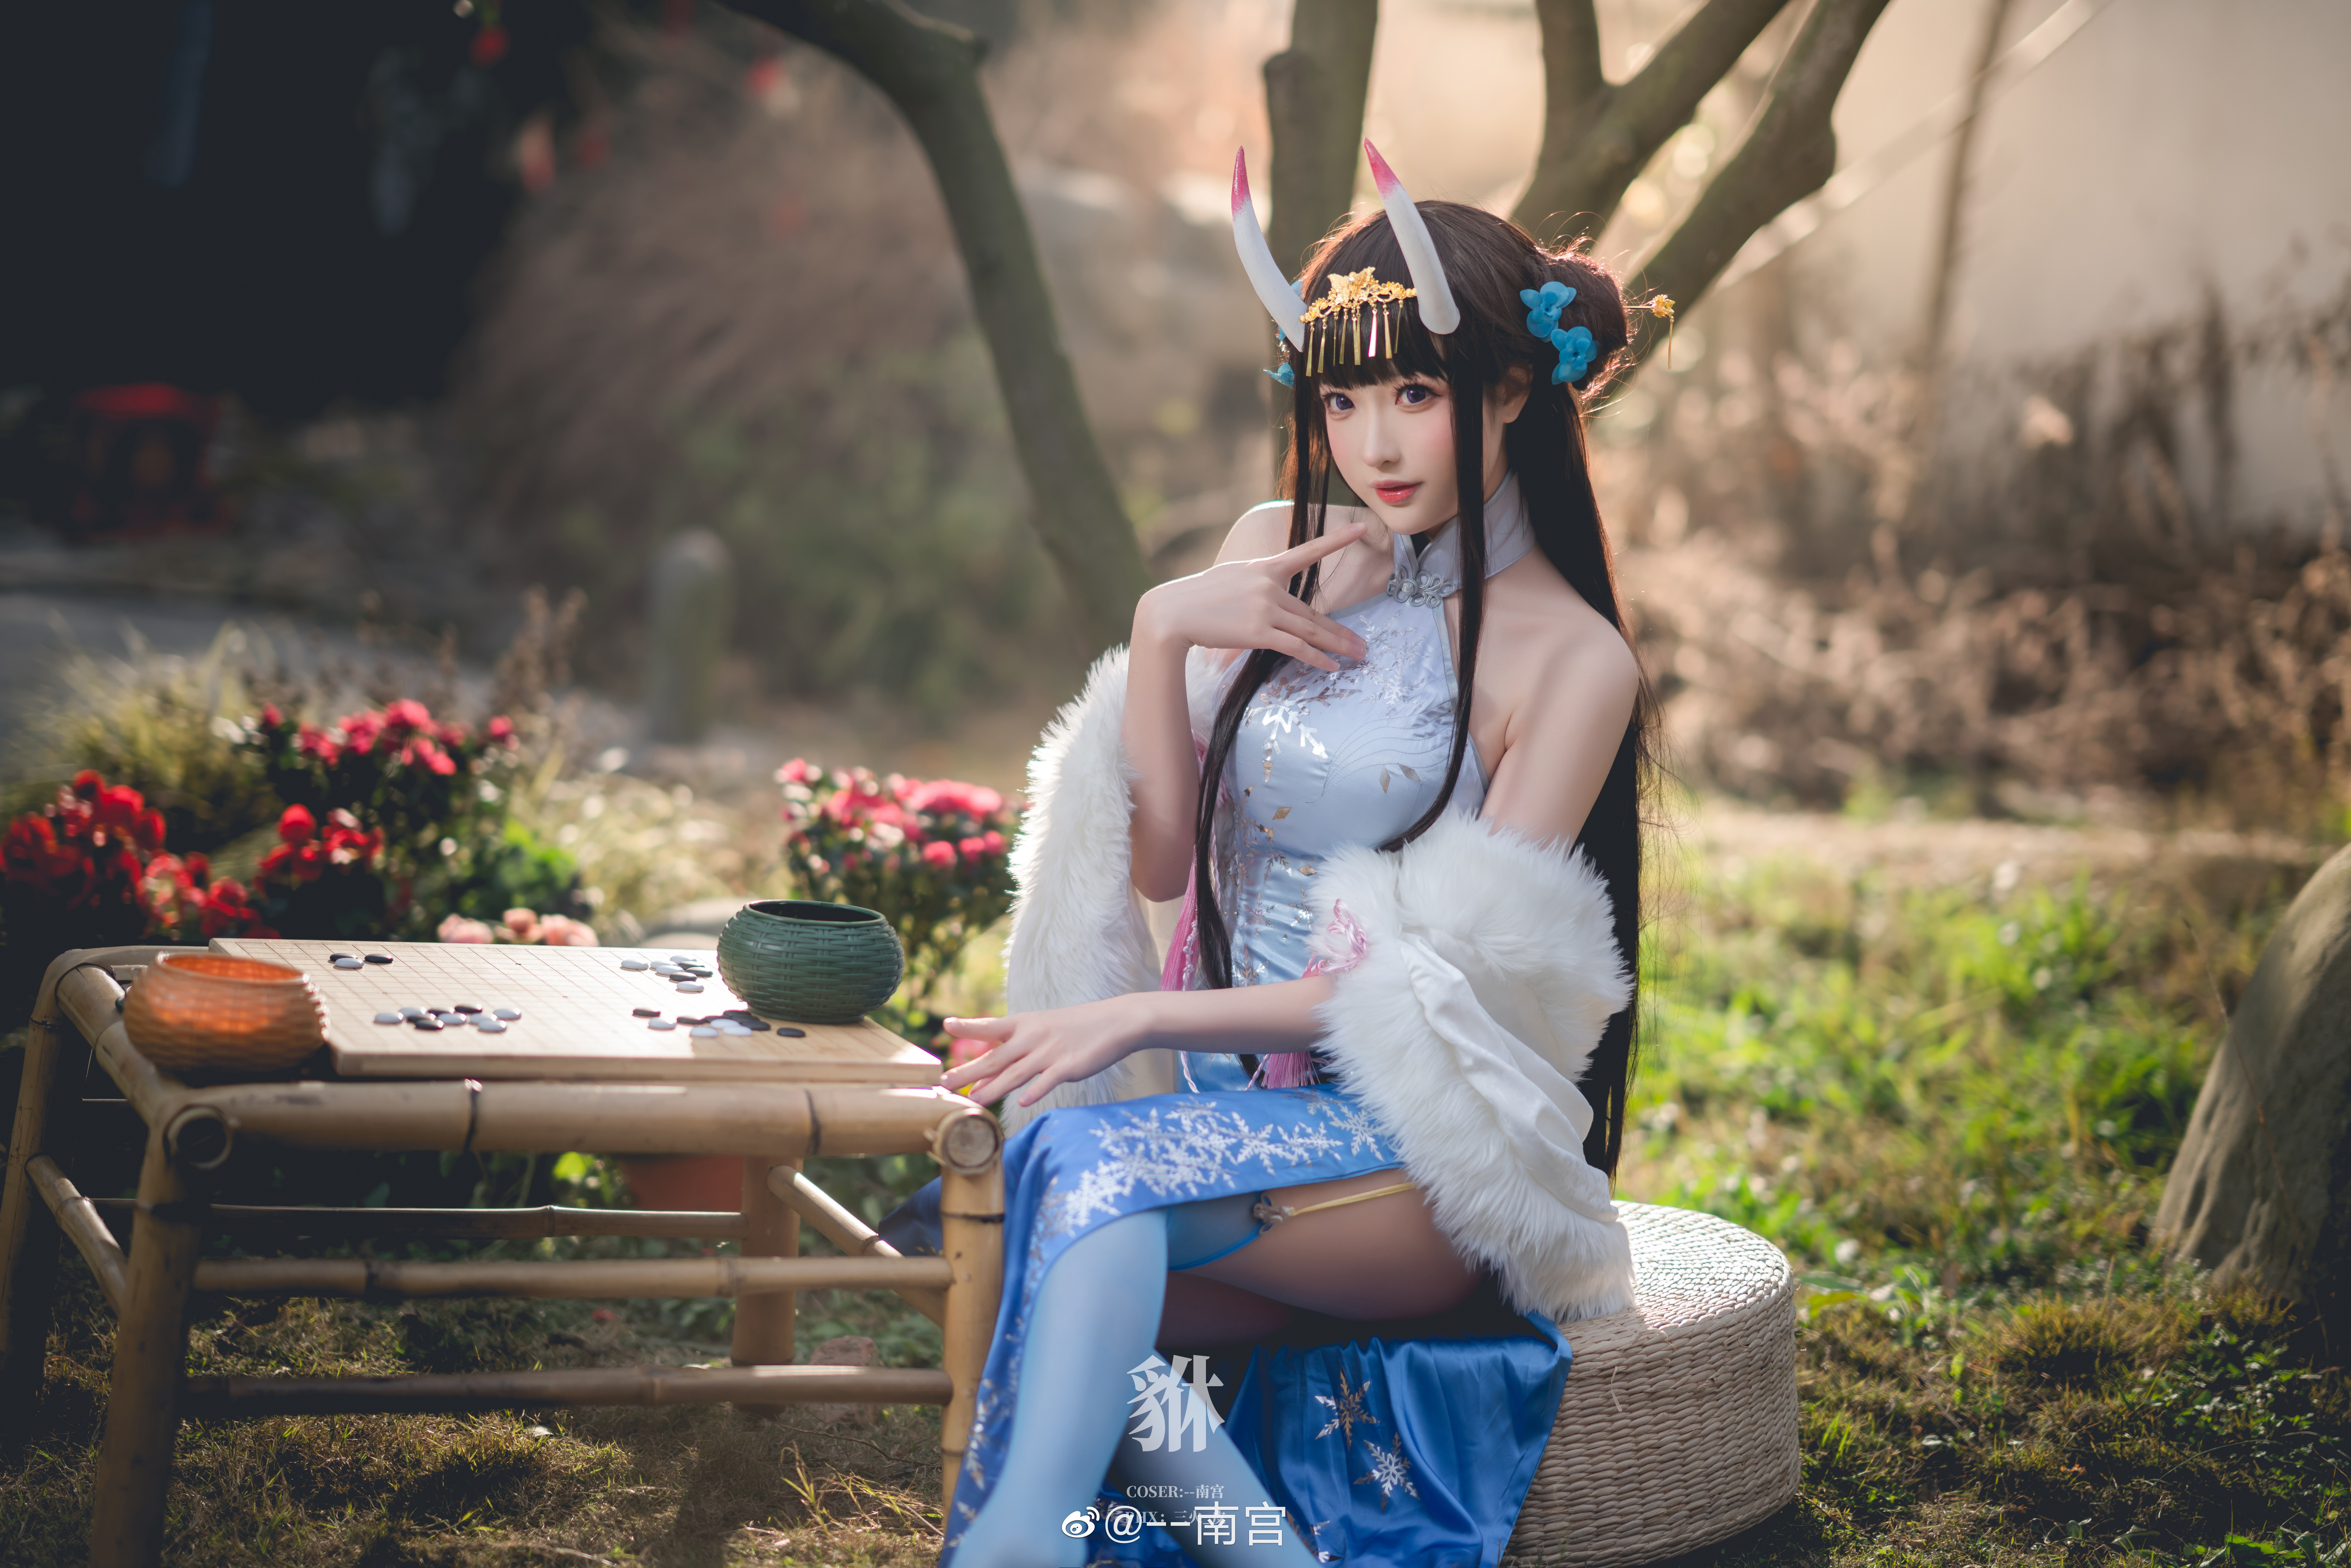 碧蓝航线 貅 cosplay Cosplay-第3张